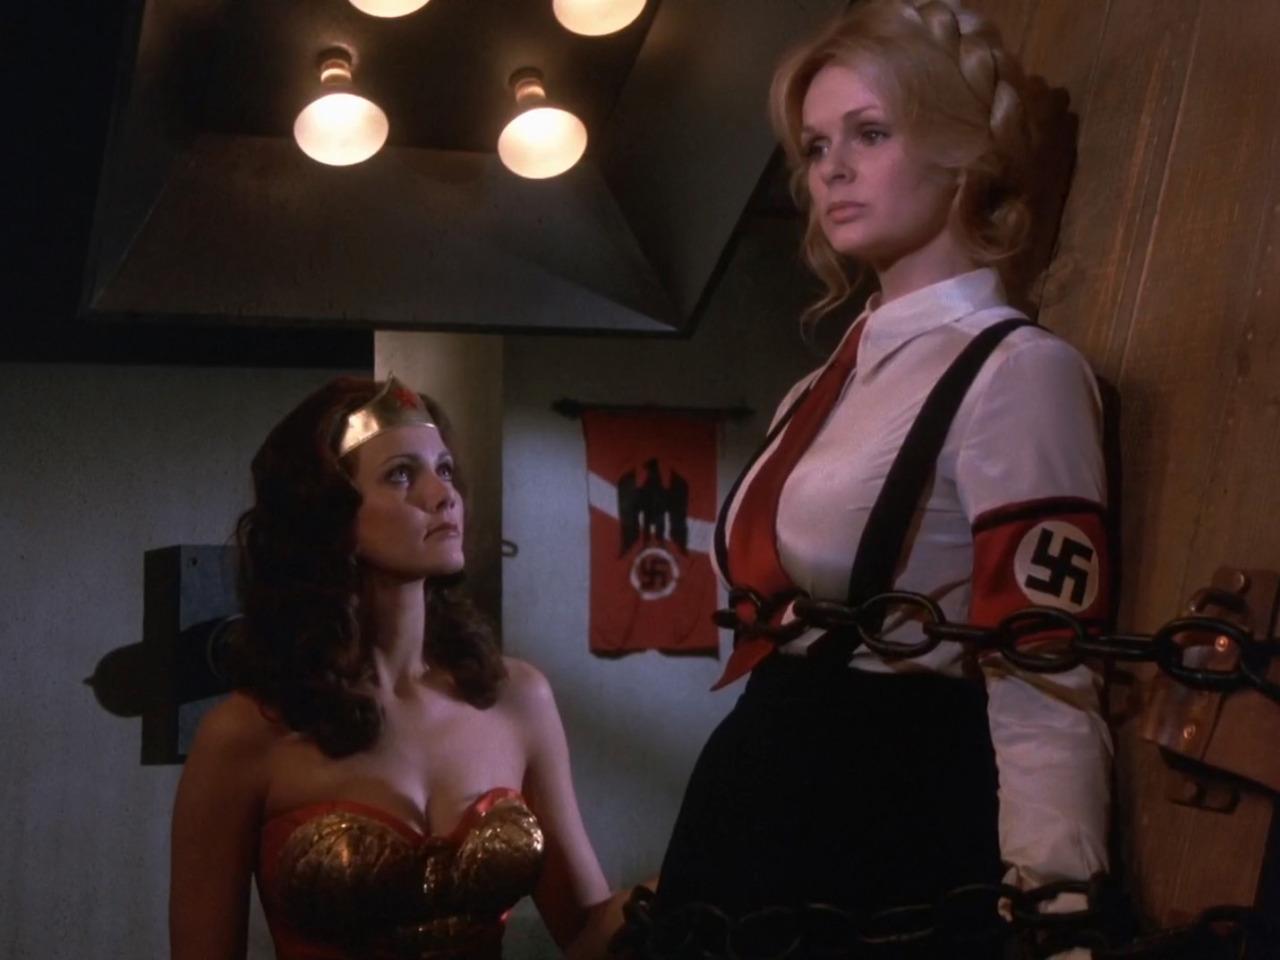 Wonder Woman (Lynda Carter) meets Fausta The Nazi Wonder Woman (Lynda Day George) in The New Original Wonder Woman (1977)